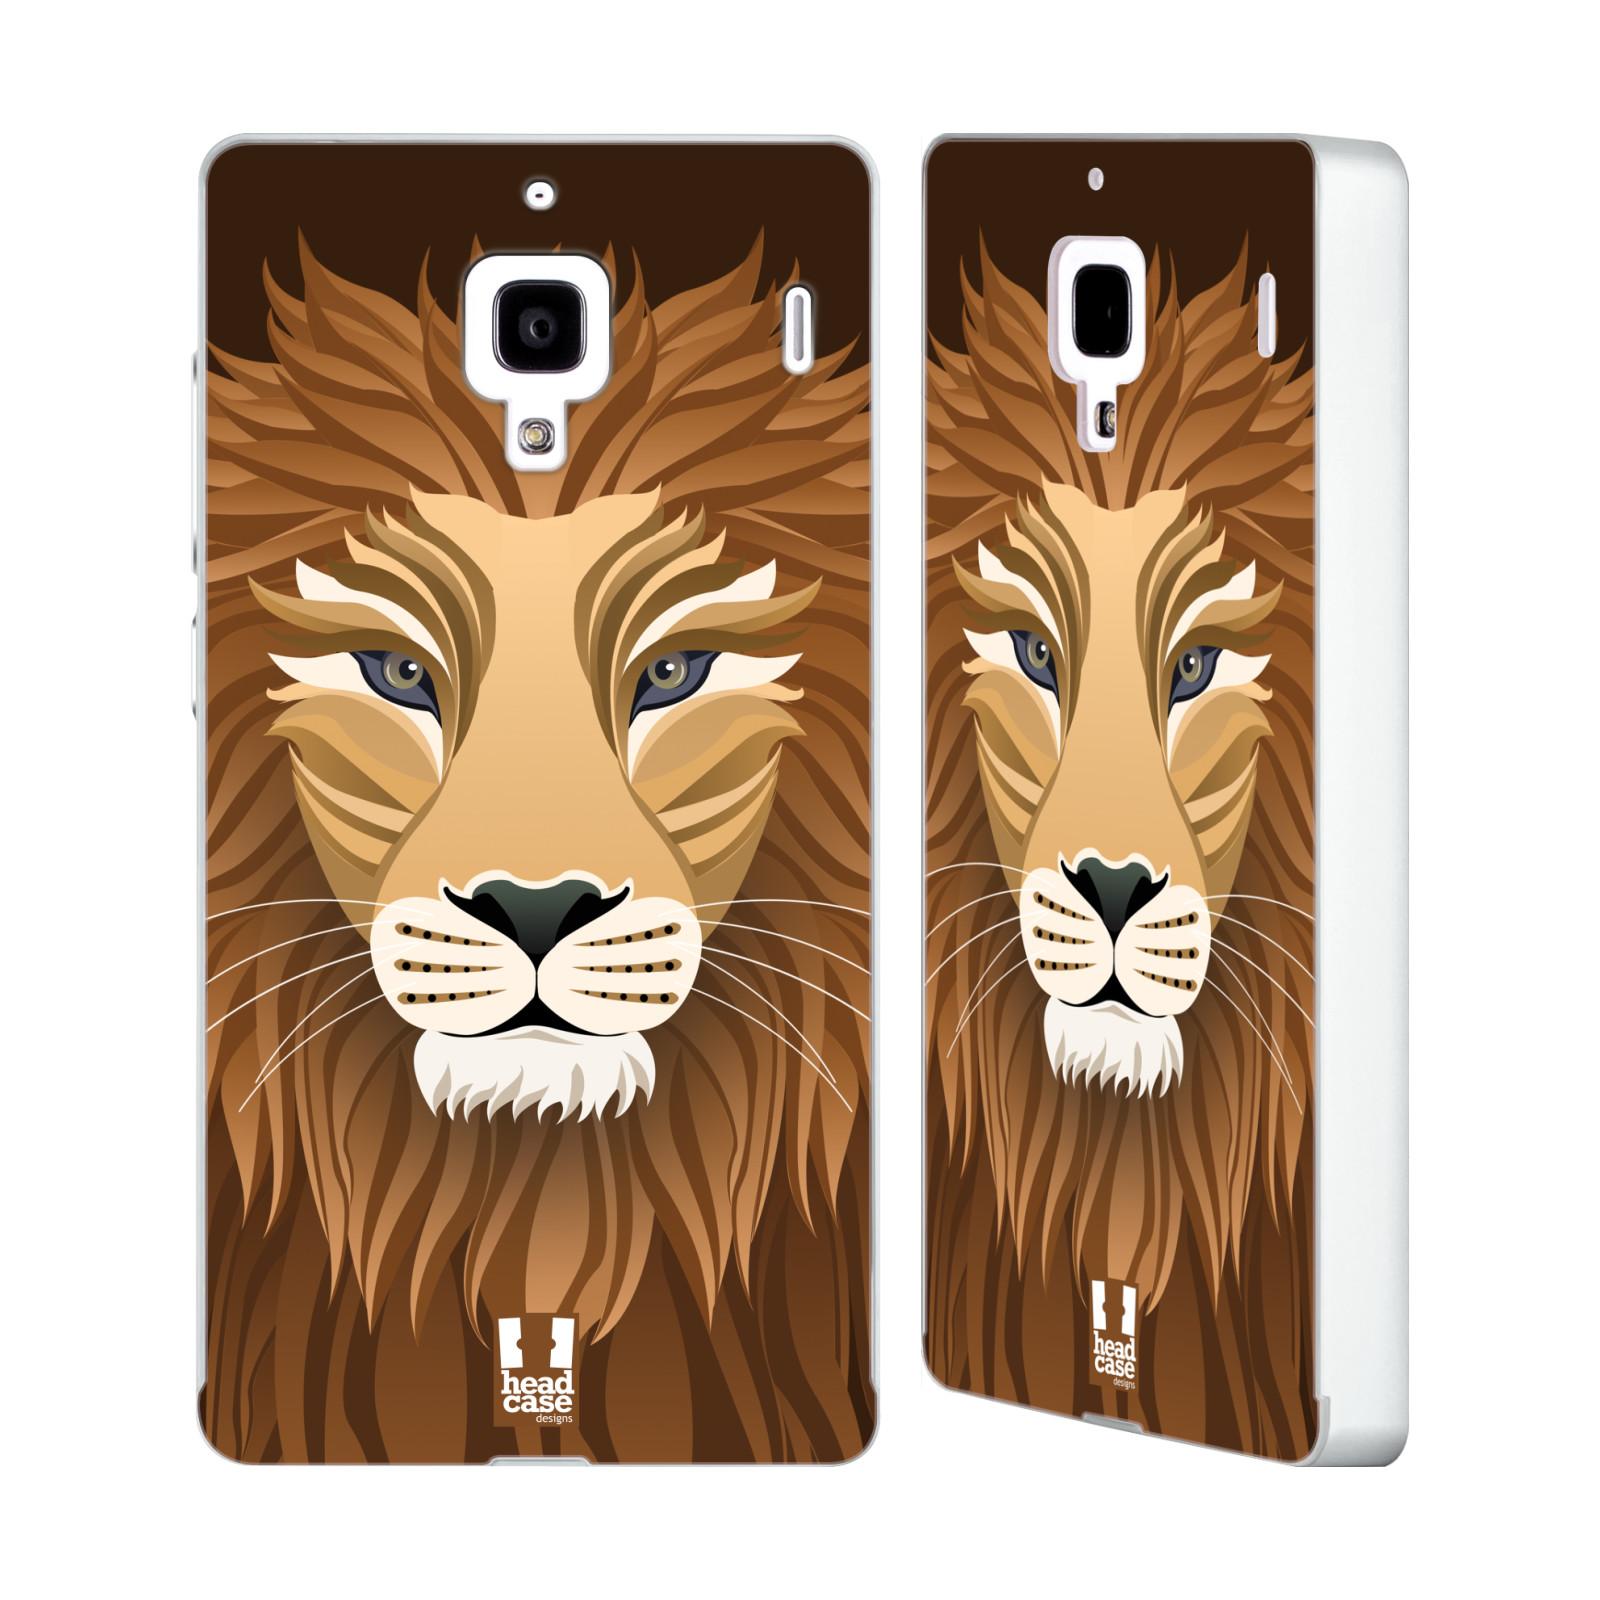 HEAD-CASE-DESIGNS-SLICK-ANIMALS-SILVER-SLIDER-CASE-FOR-HUAWEI-XIAOMI-PHONES